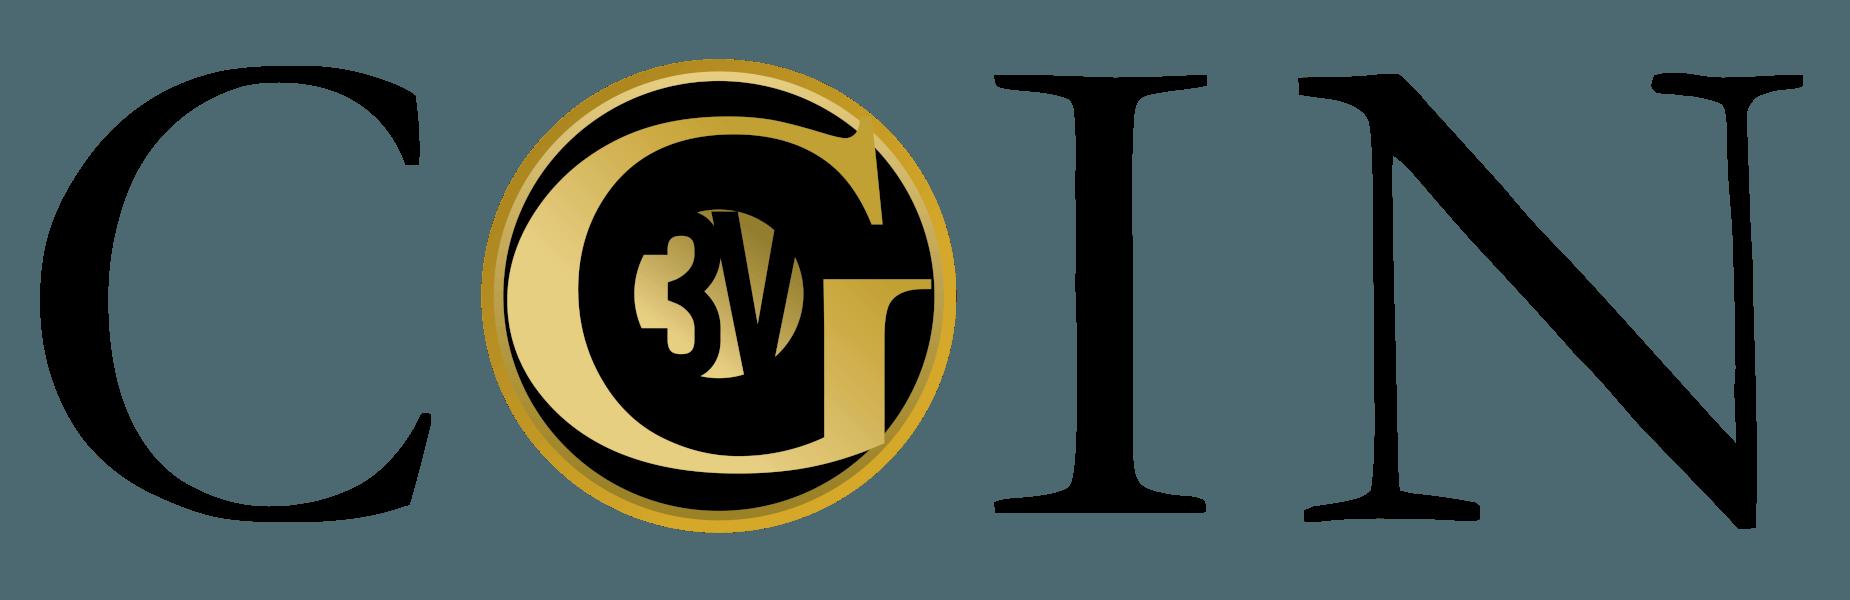 Joanna Rucińska Marketing Director 3V Group png logo 3V Group Ltd. Exchange House 2 Queen Street WF1 1JR Wakefield United Kingdom Mobile: +44 74790 702146 Tel. kom.: +48 793 391 313 www.3vgroup.com.pl www.3vcoin.io